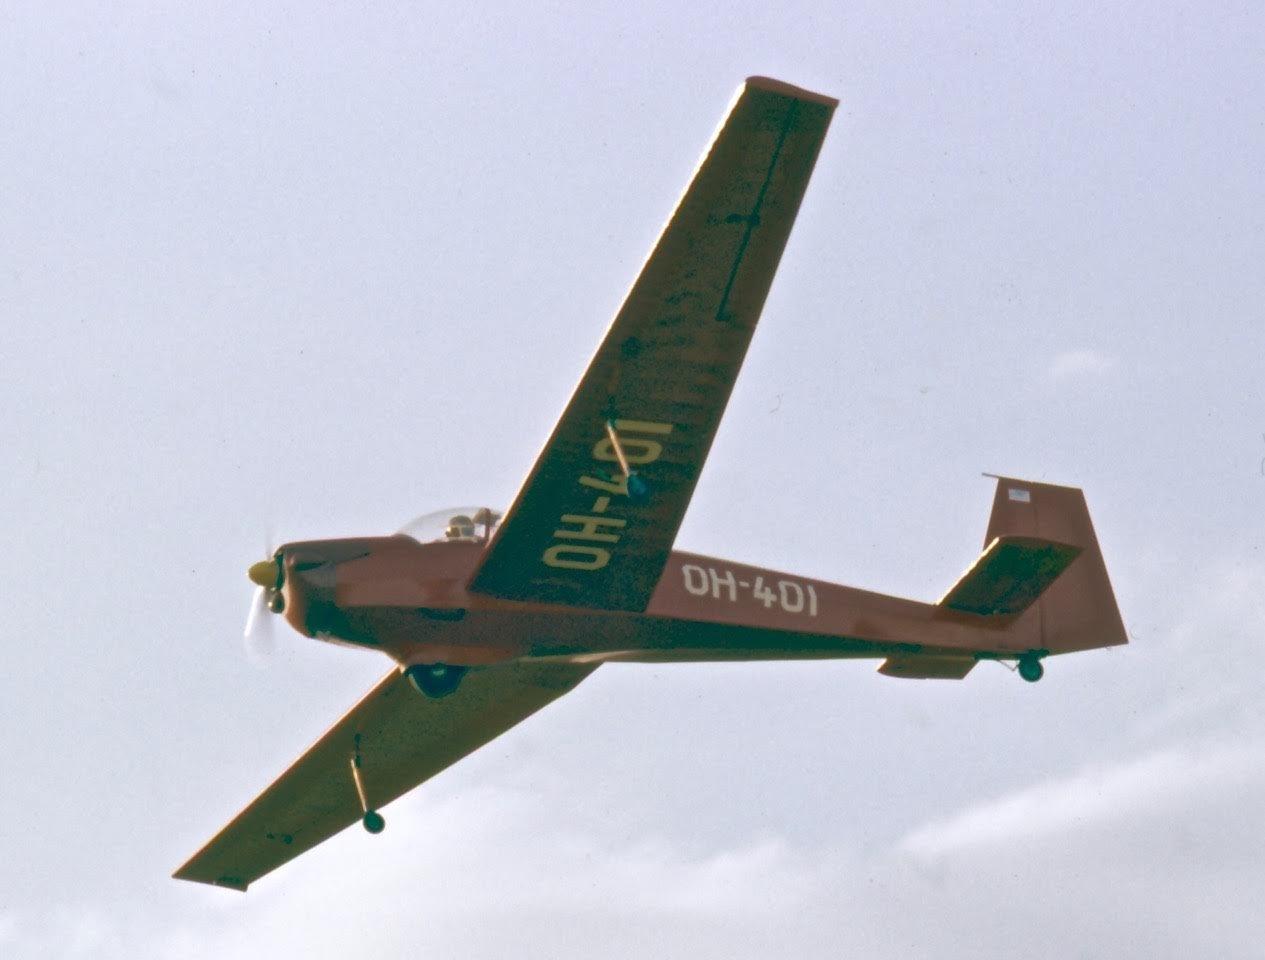 Scheibe SF-25B Falke OH-401 EFHN 1970s